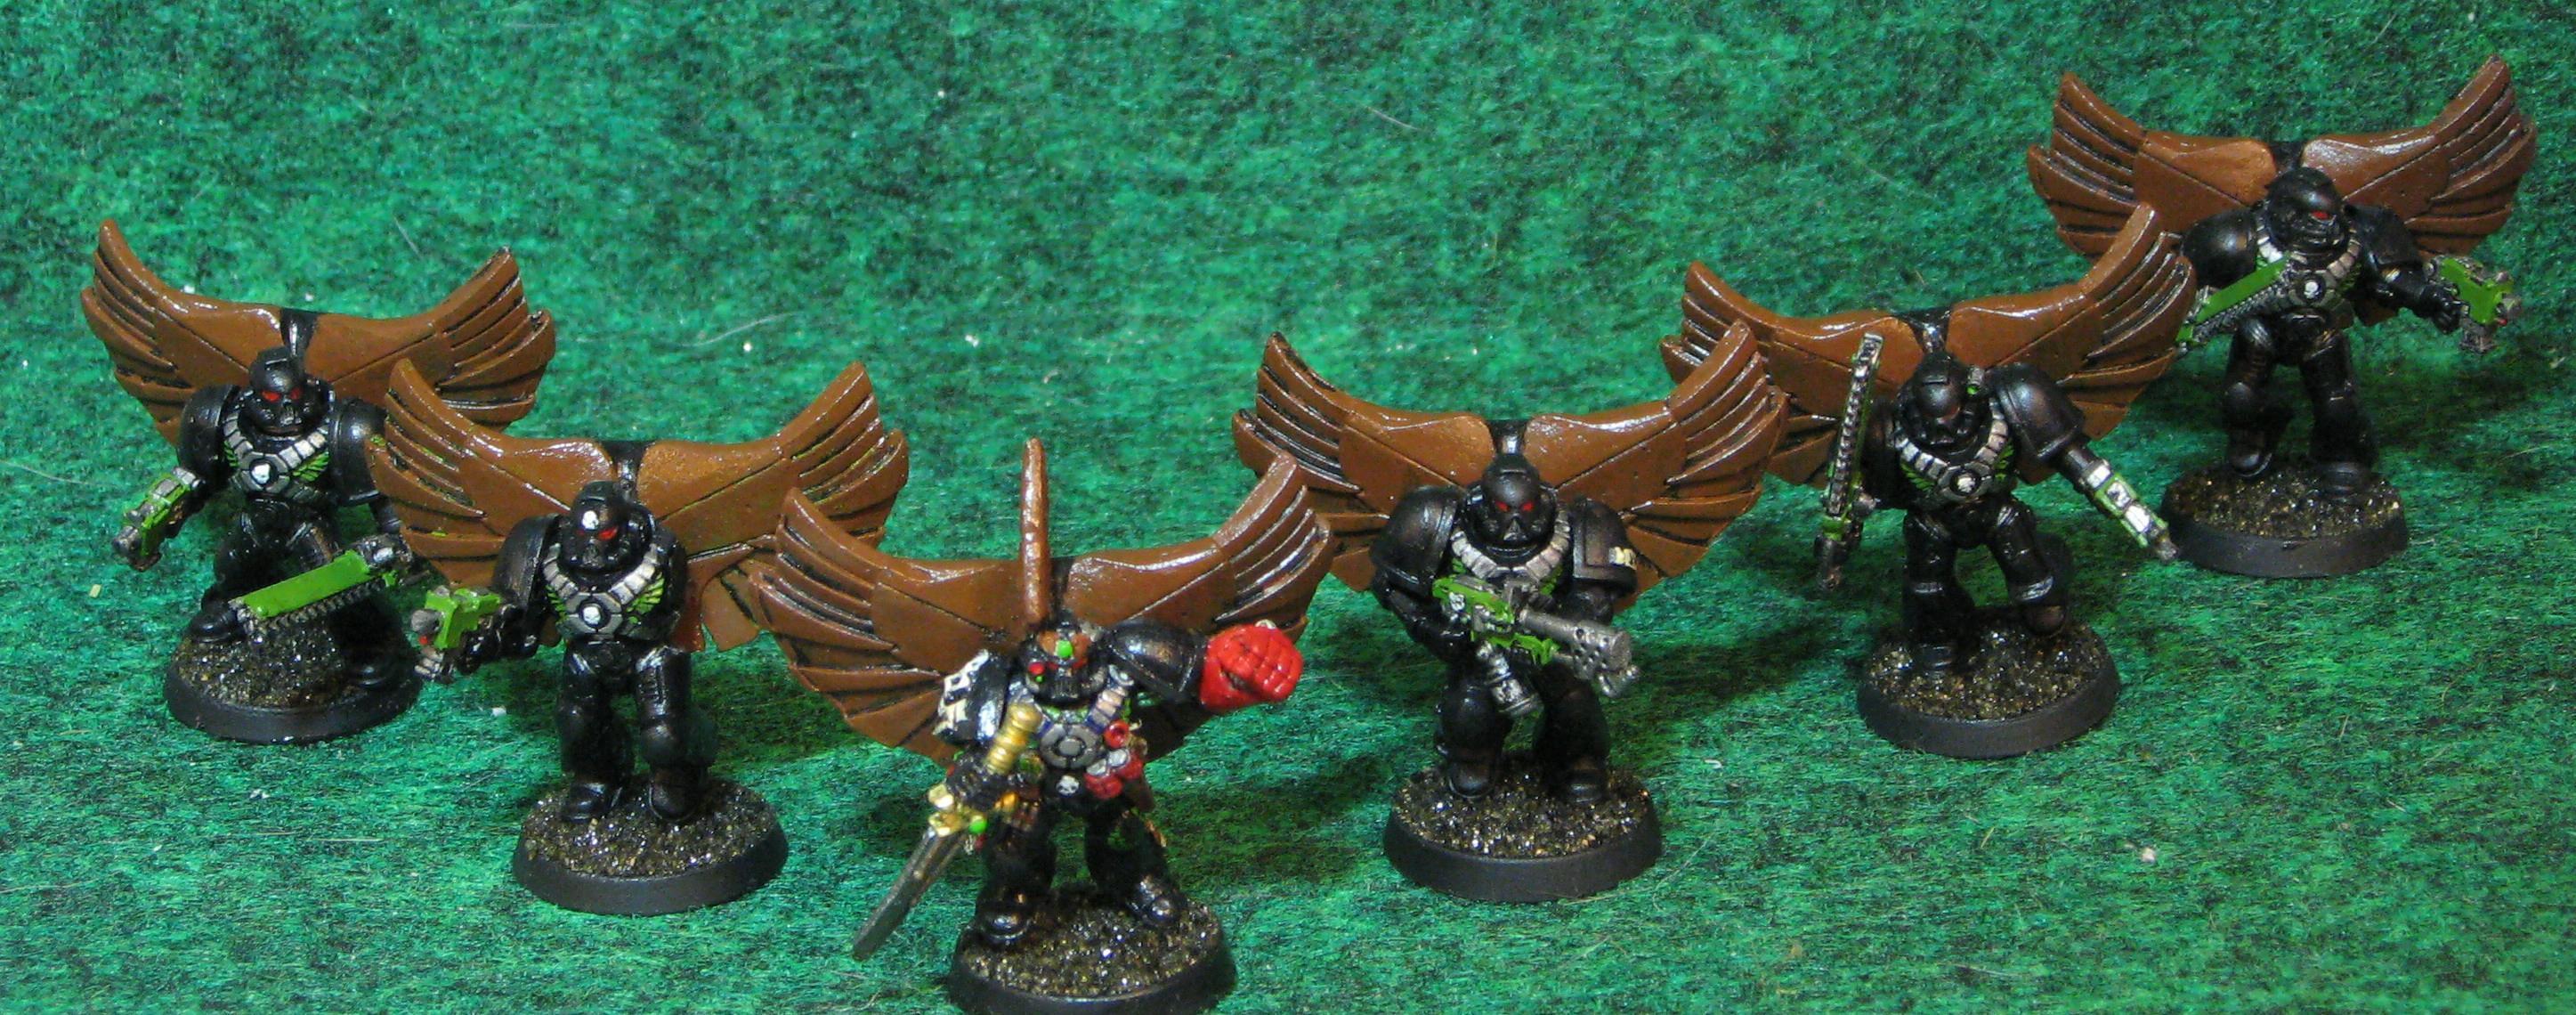 Assault Marines, Conversion, Space Marines, Warhammer 40,000, Winged